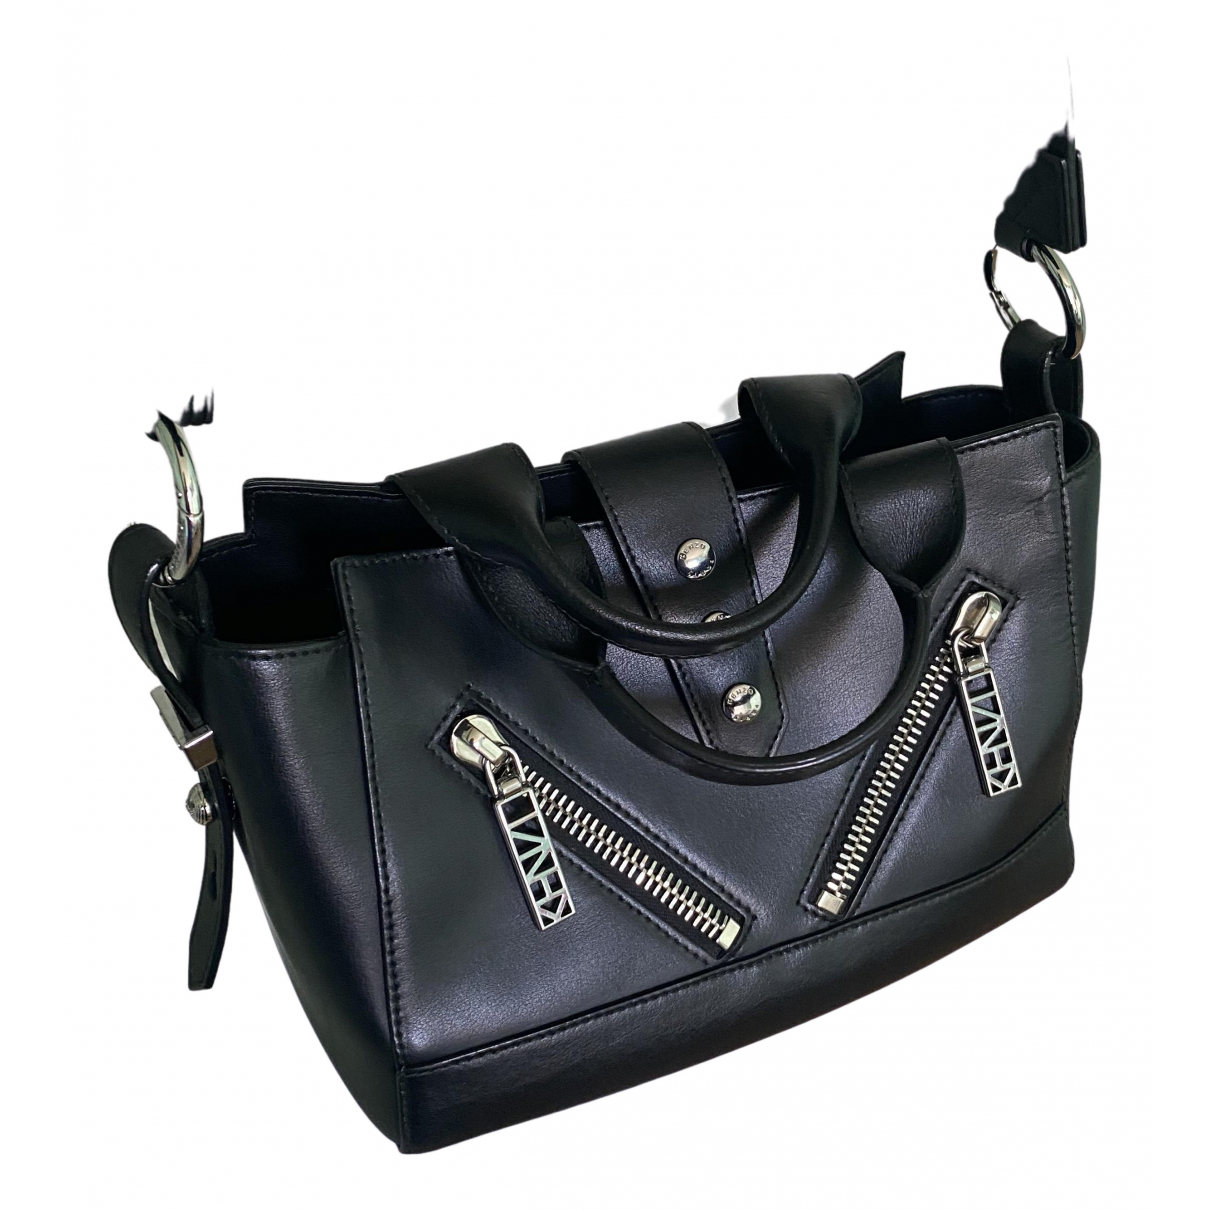 Kenzo Kalifornia Handtasche in  Schwarz Leder